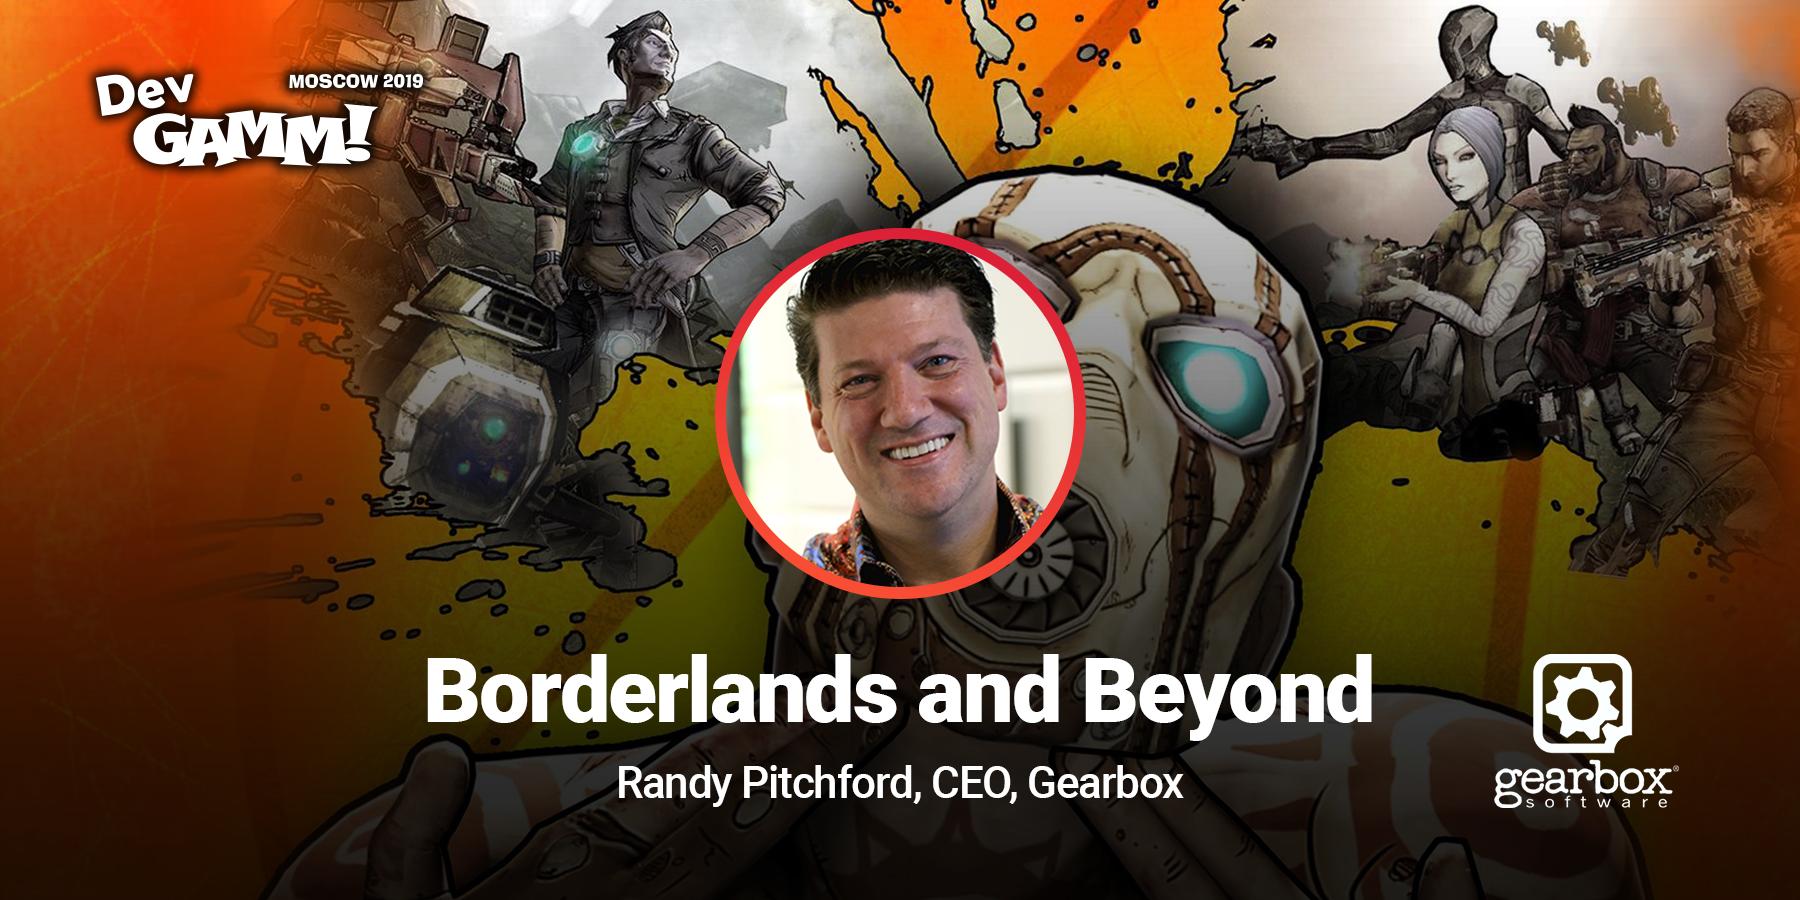 Топ-доклад: Рэнди Питчфорд о Borderlands